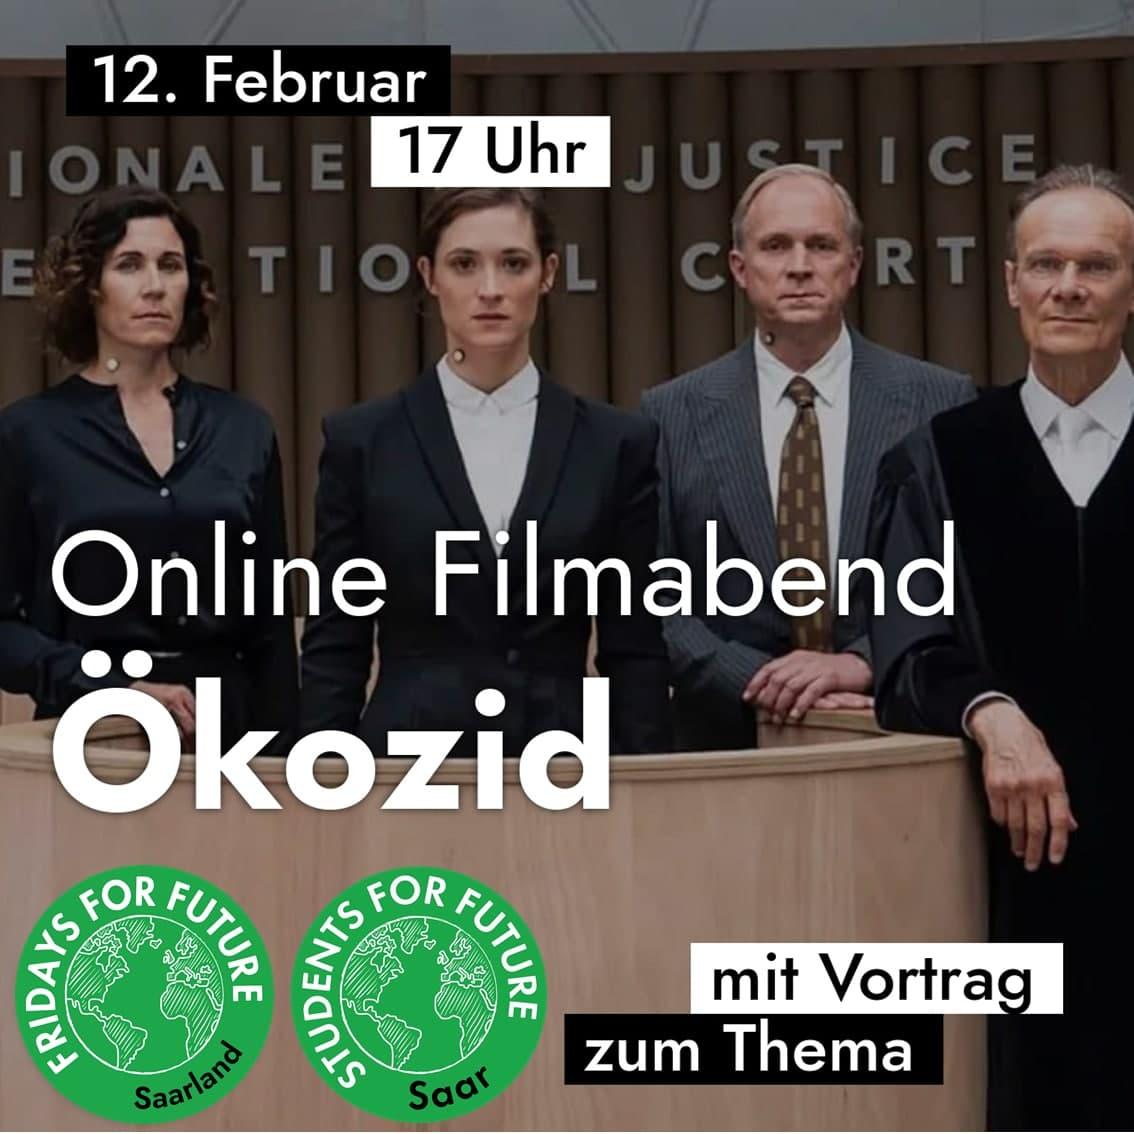 Online Filmeabend Ökozid